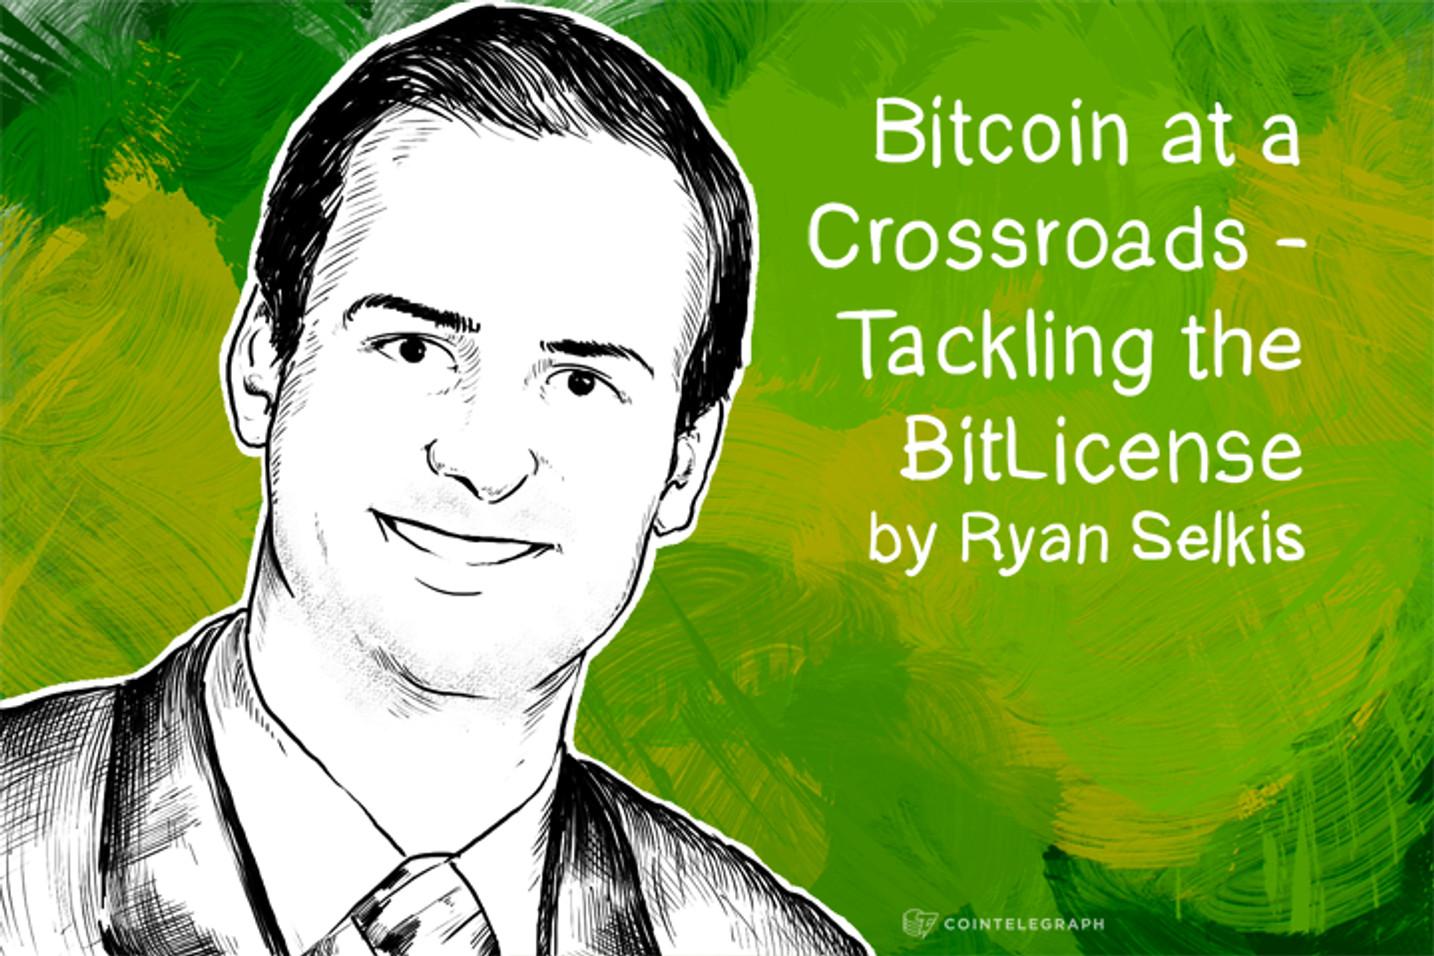 Bitcoin at a Crossroads - Tackling the BitLicense